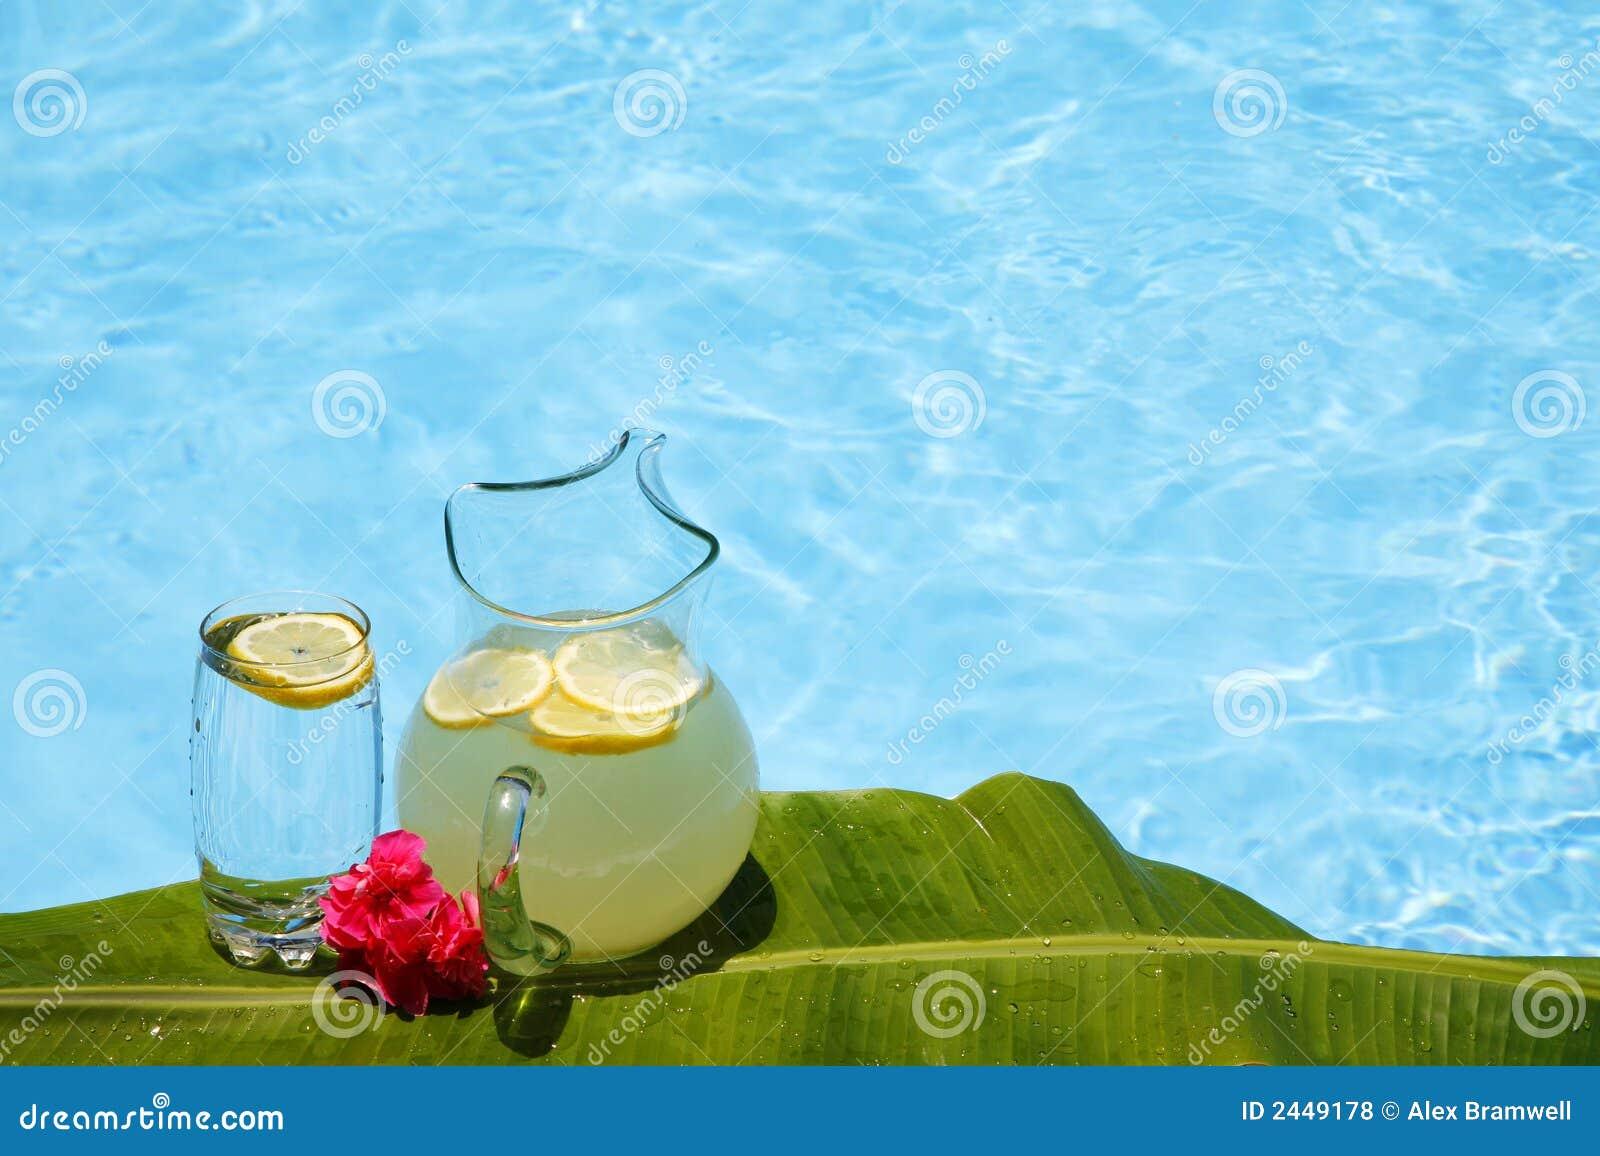 Lemonadesommar